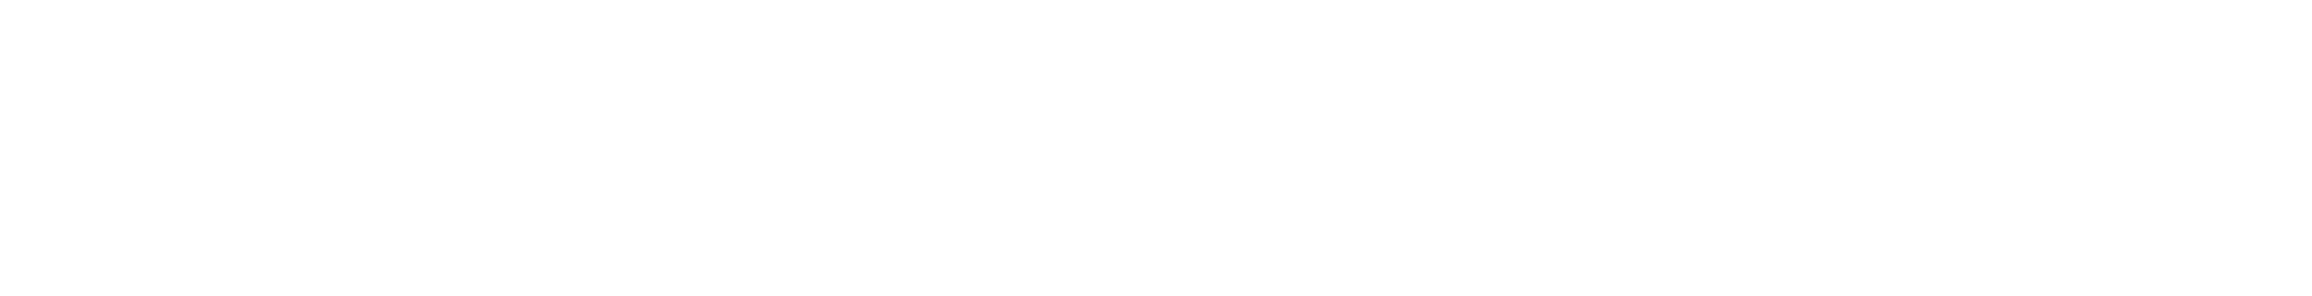 age-logo-notagline-white